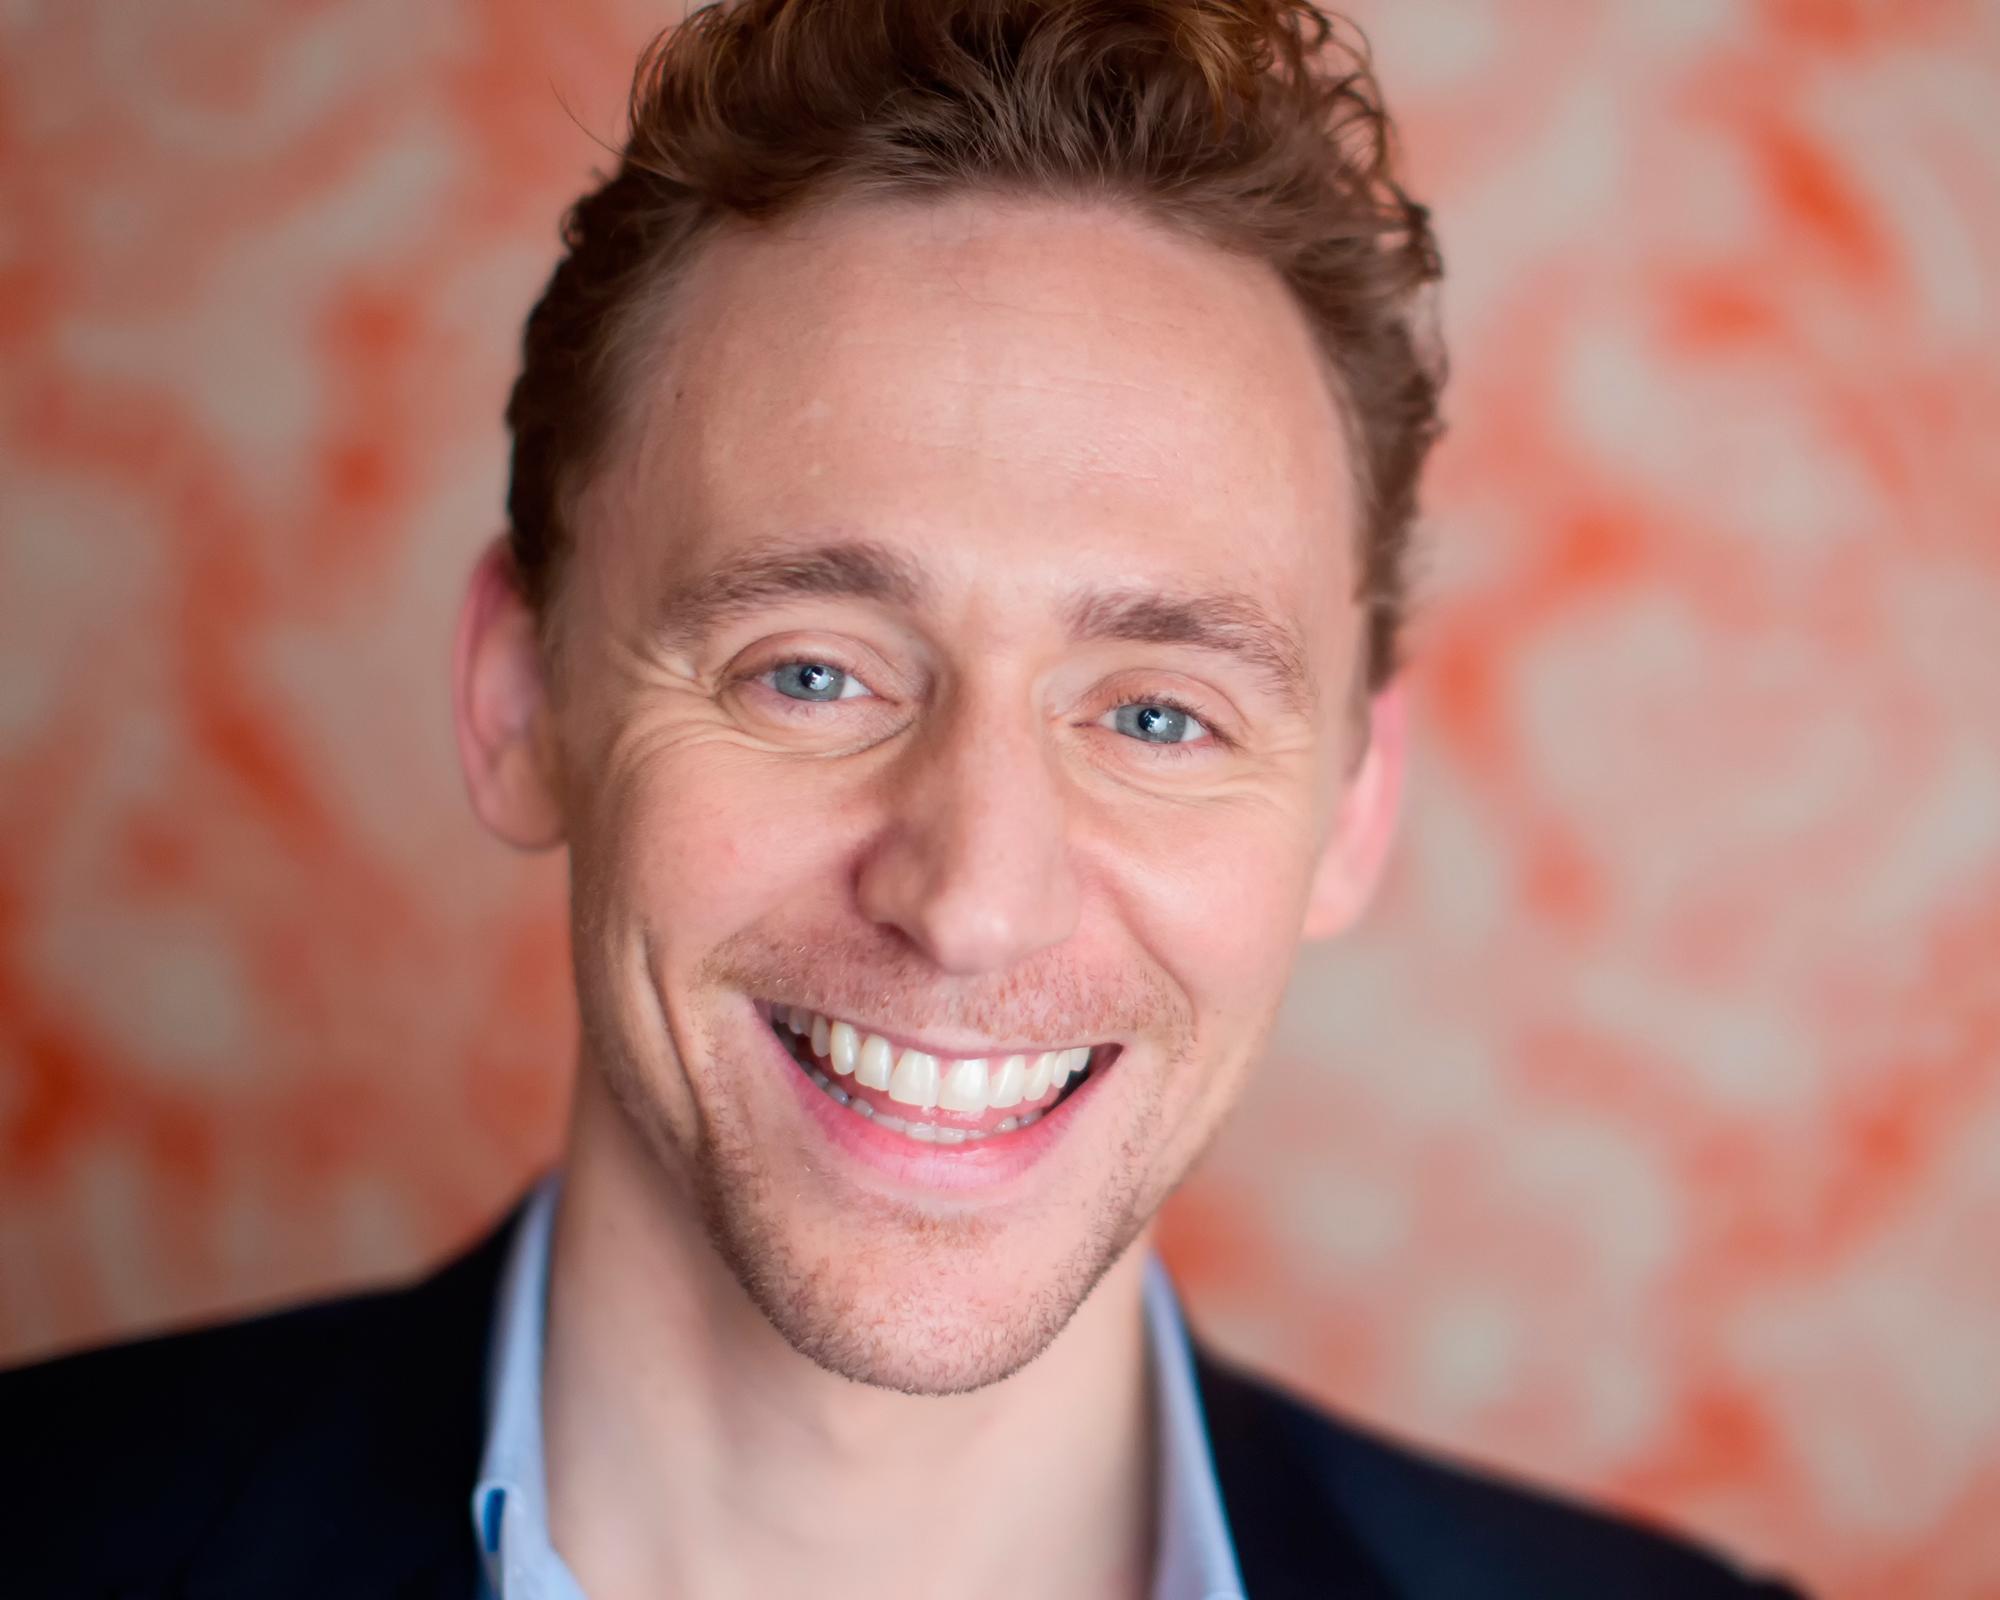 Cute Baby Girl New Wallpaper Hd Tom Hiddleston Actor Face Photo Shoot Smile